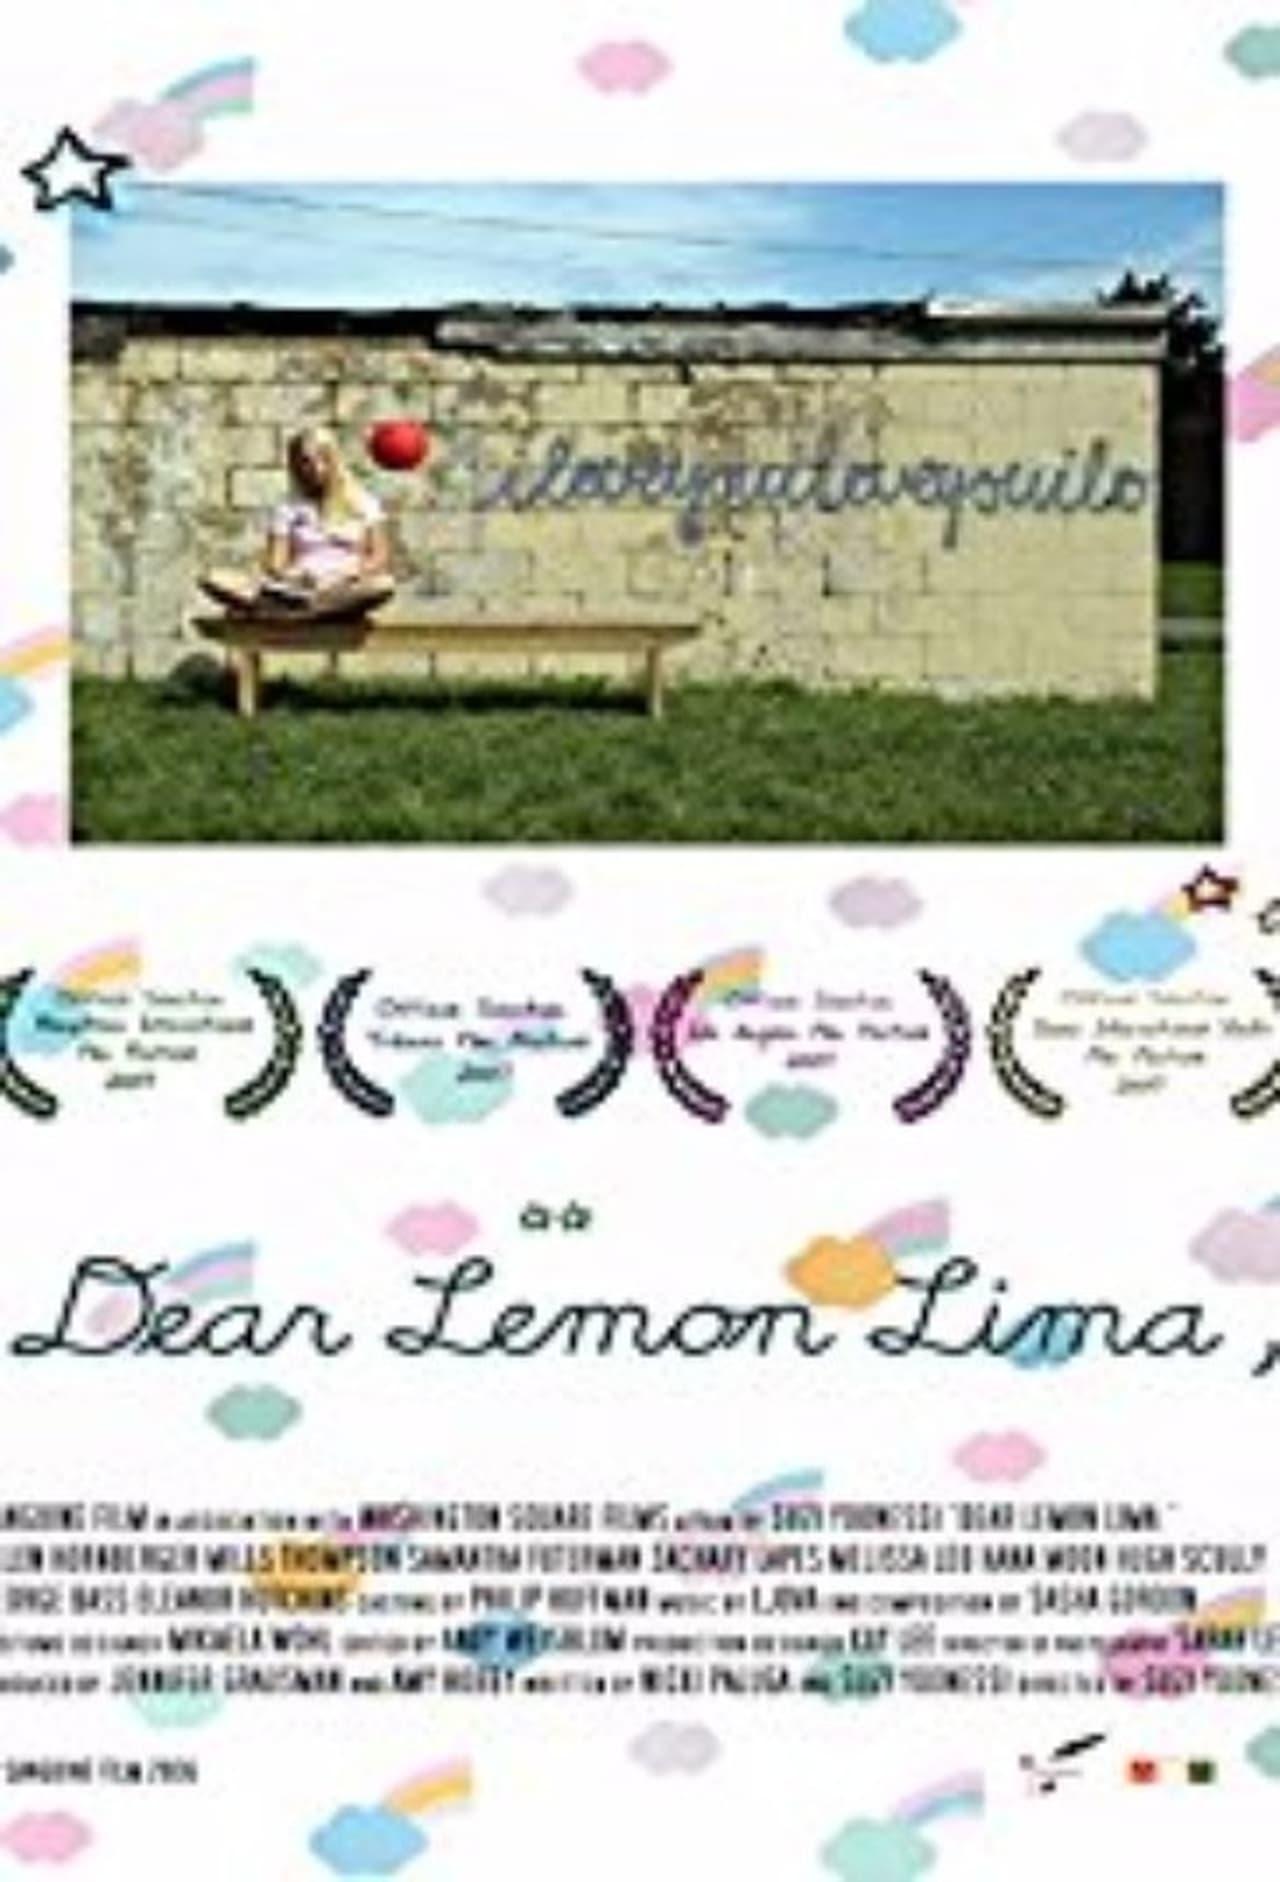 Dear Lemon Lima